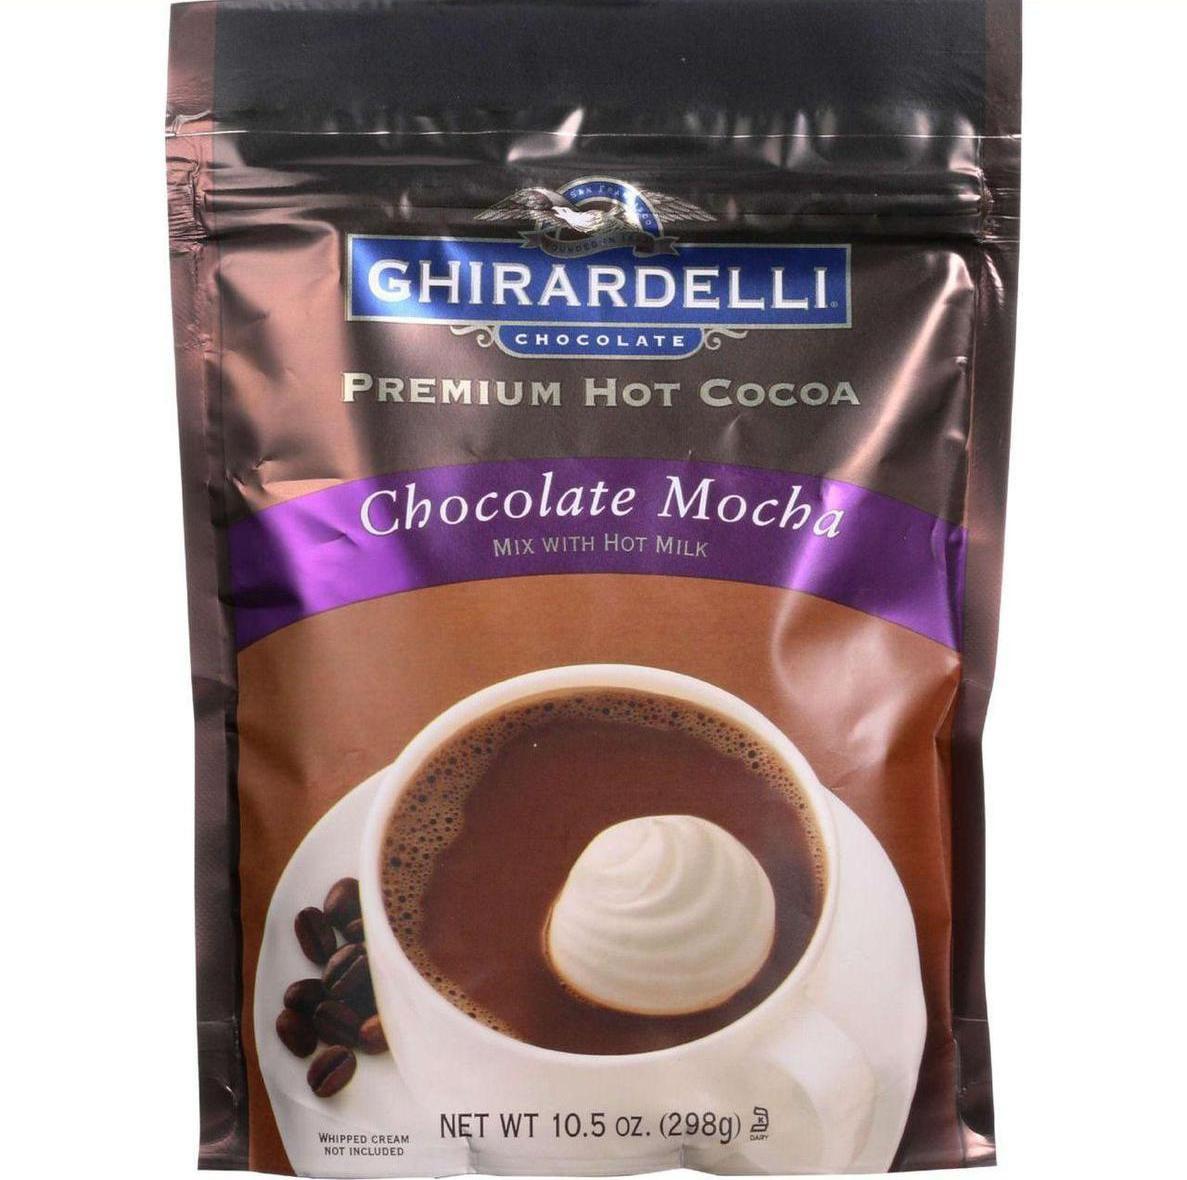 Ghirardelli Hot Cocoa Premium Chocolate Mocha 10.5 oz case of 6 by